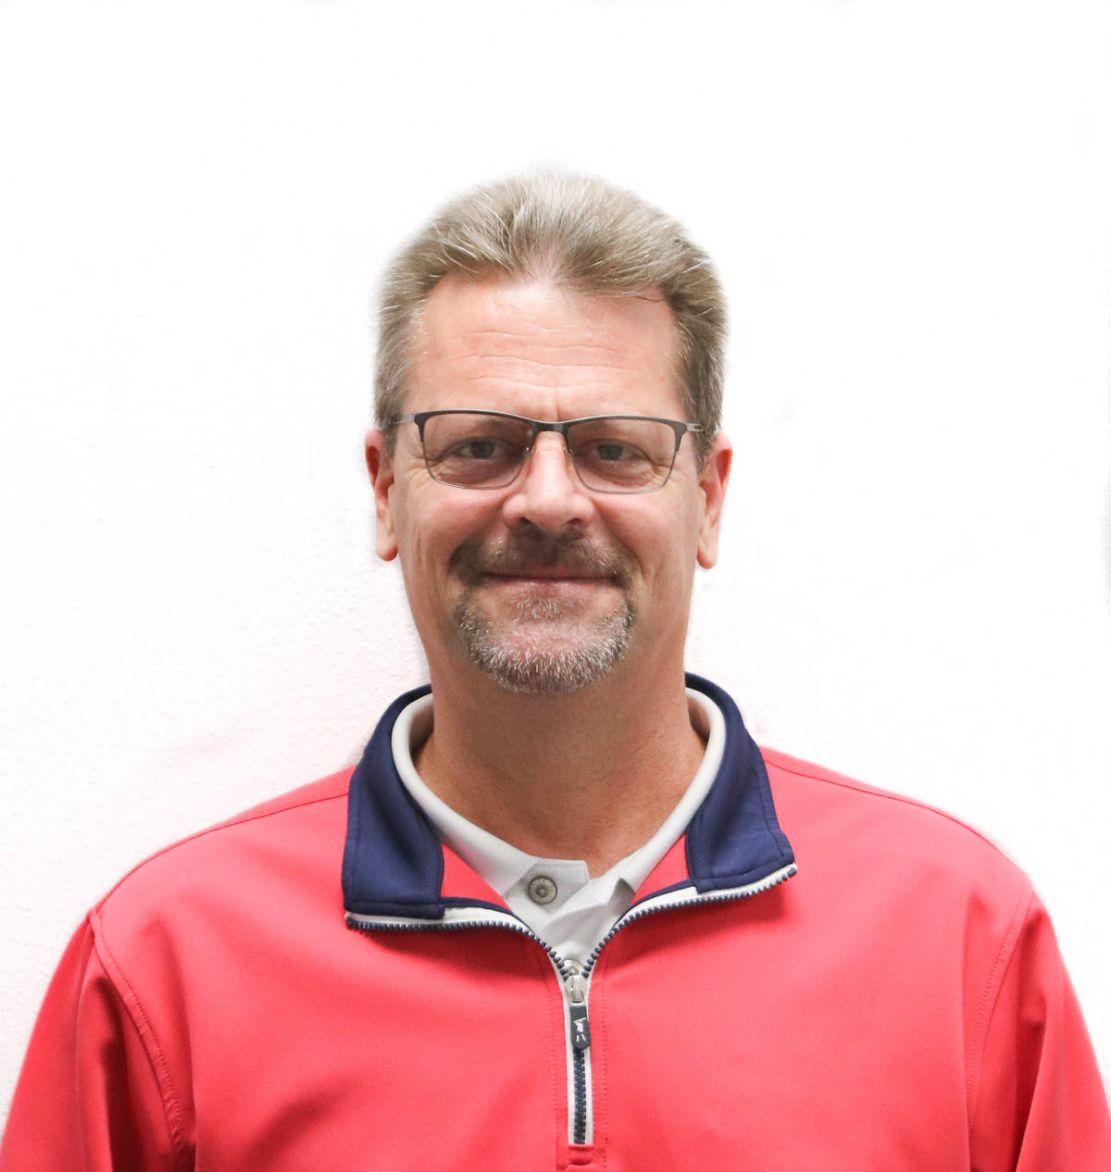 Michael Slawson